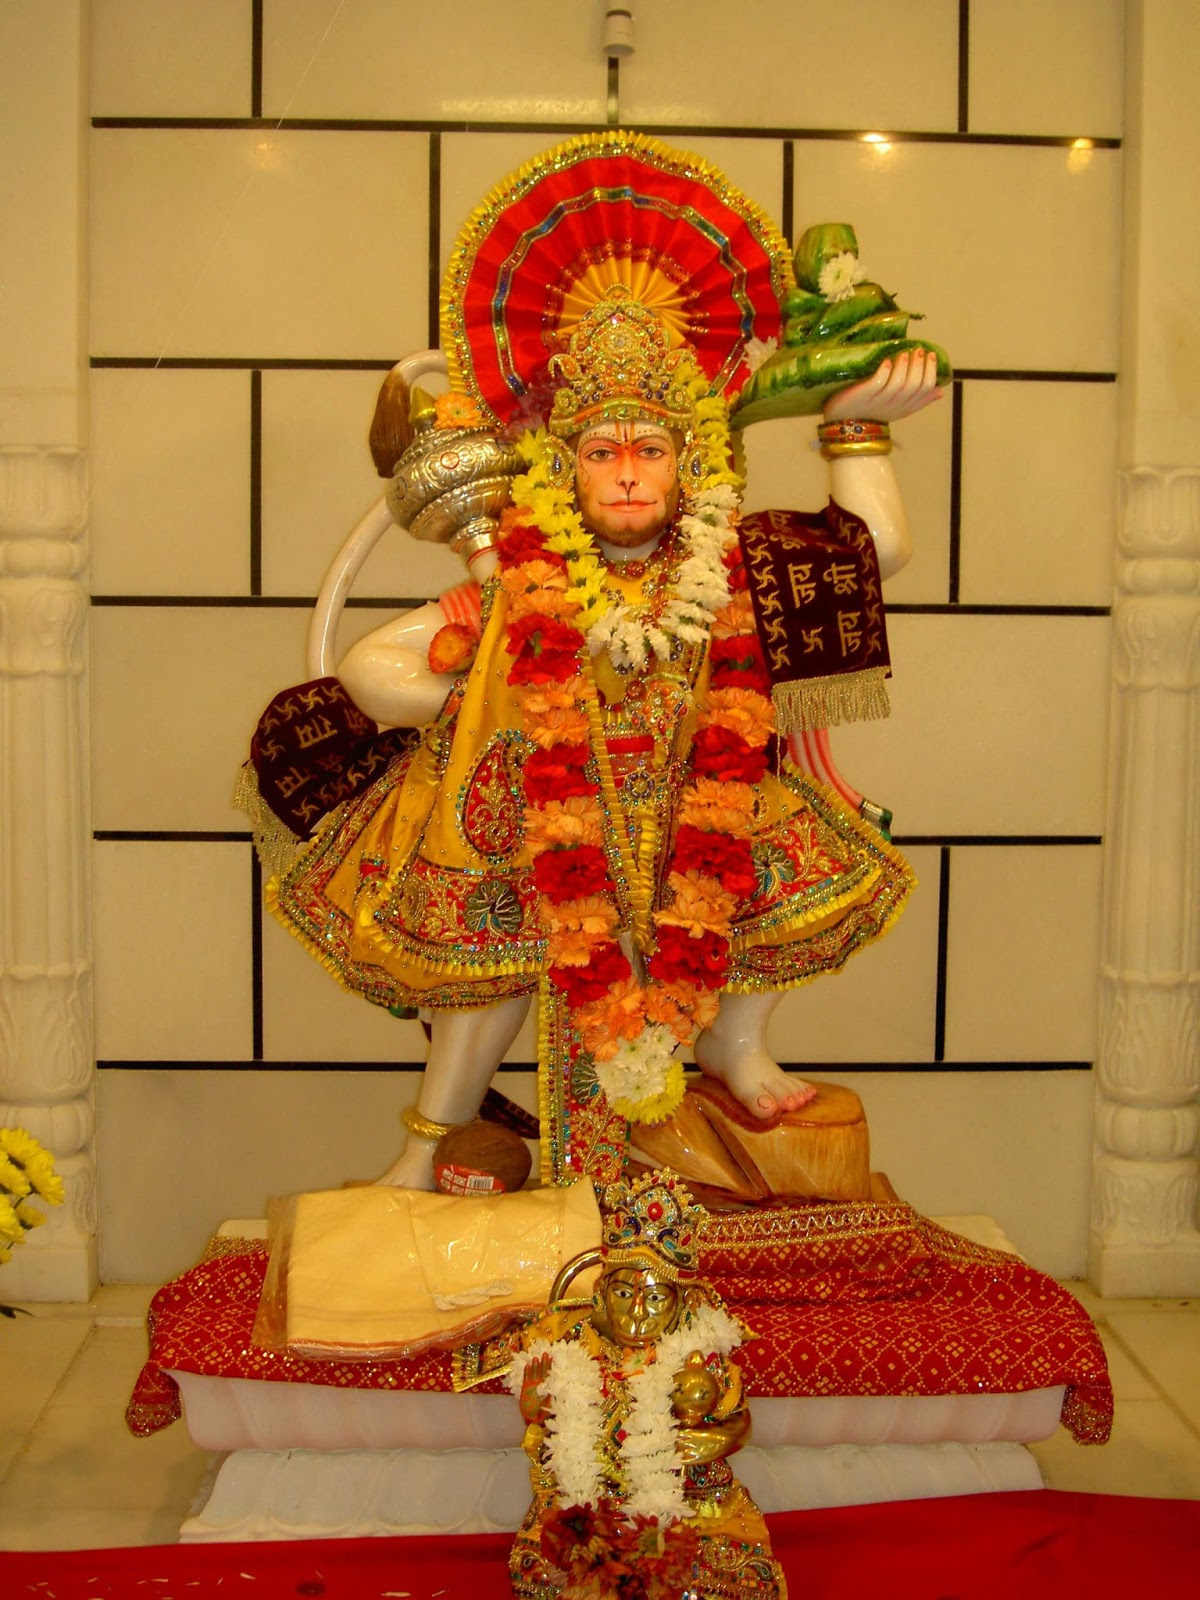 The Fresh Wallpaper New Hd Images Of Hanumanji Free Download